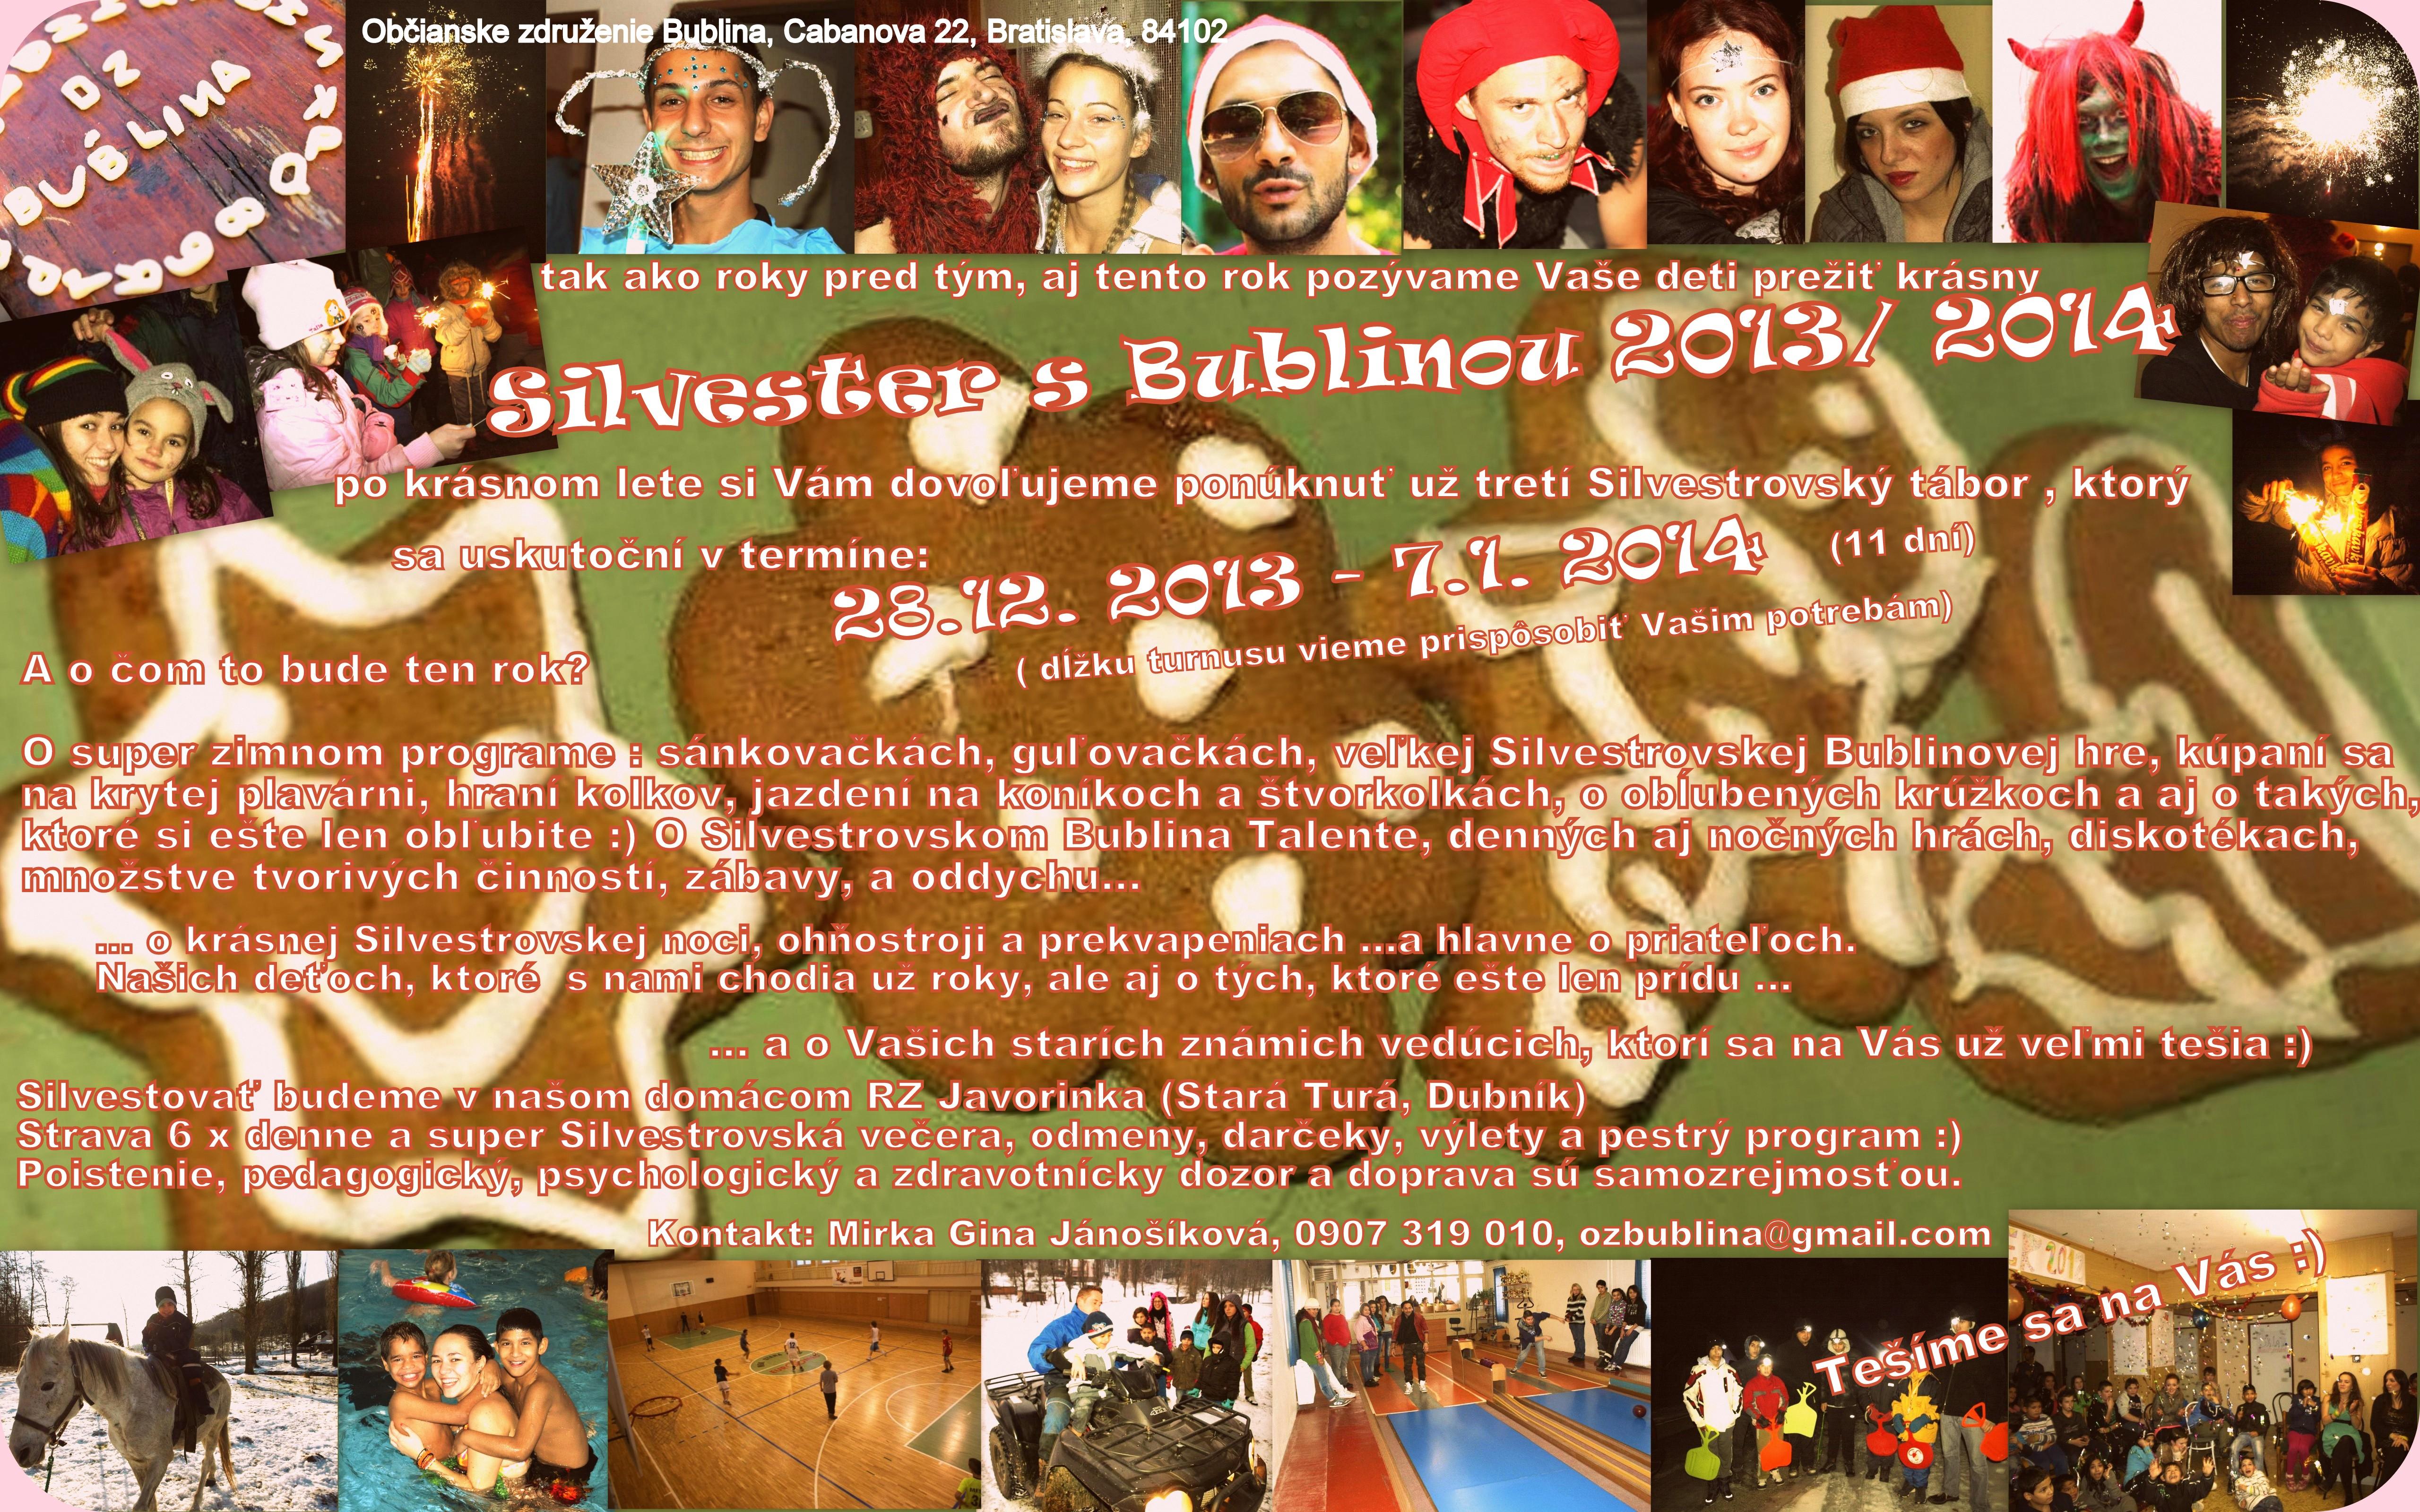 Ponuka Silvester 2013 2014